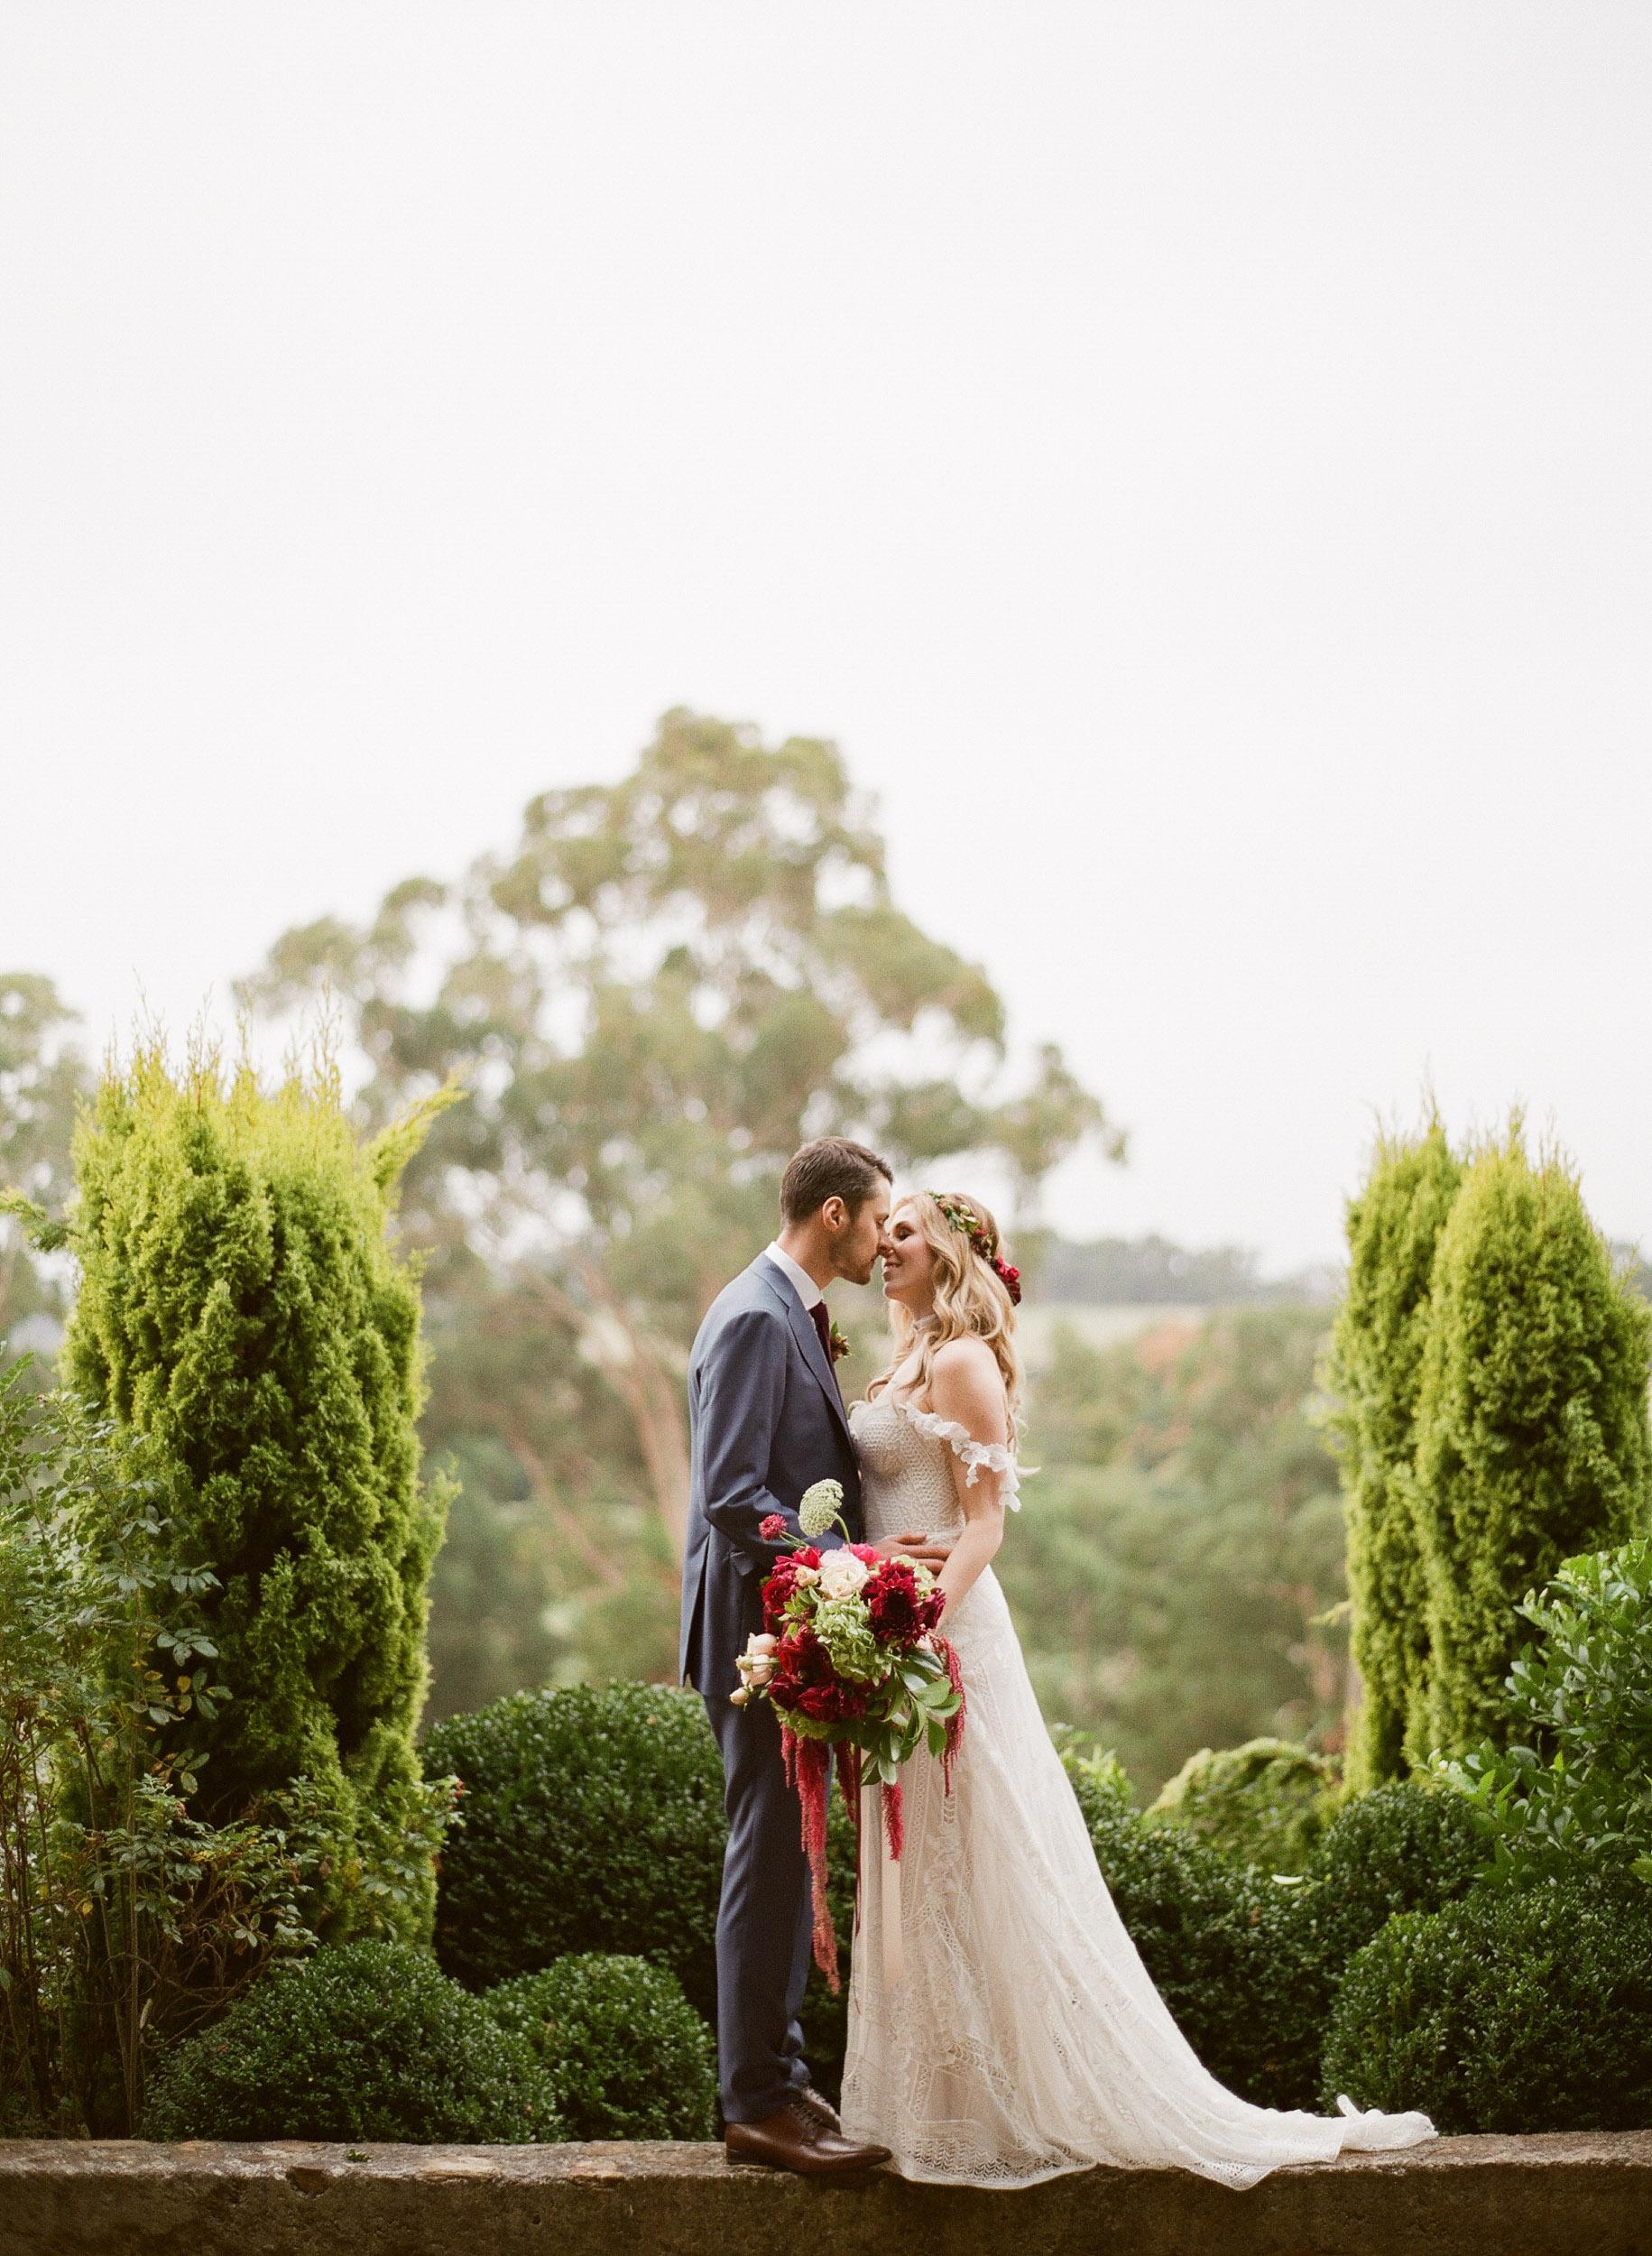 wedding (18 of 24) - 000098140006.jpg